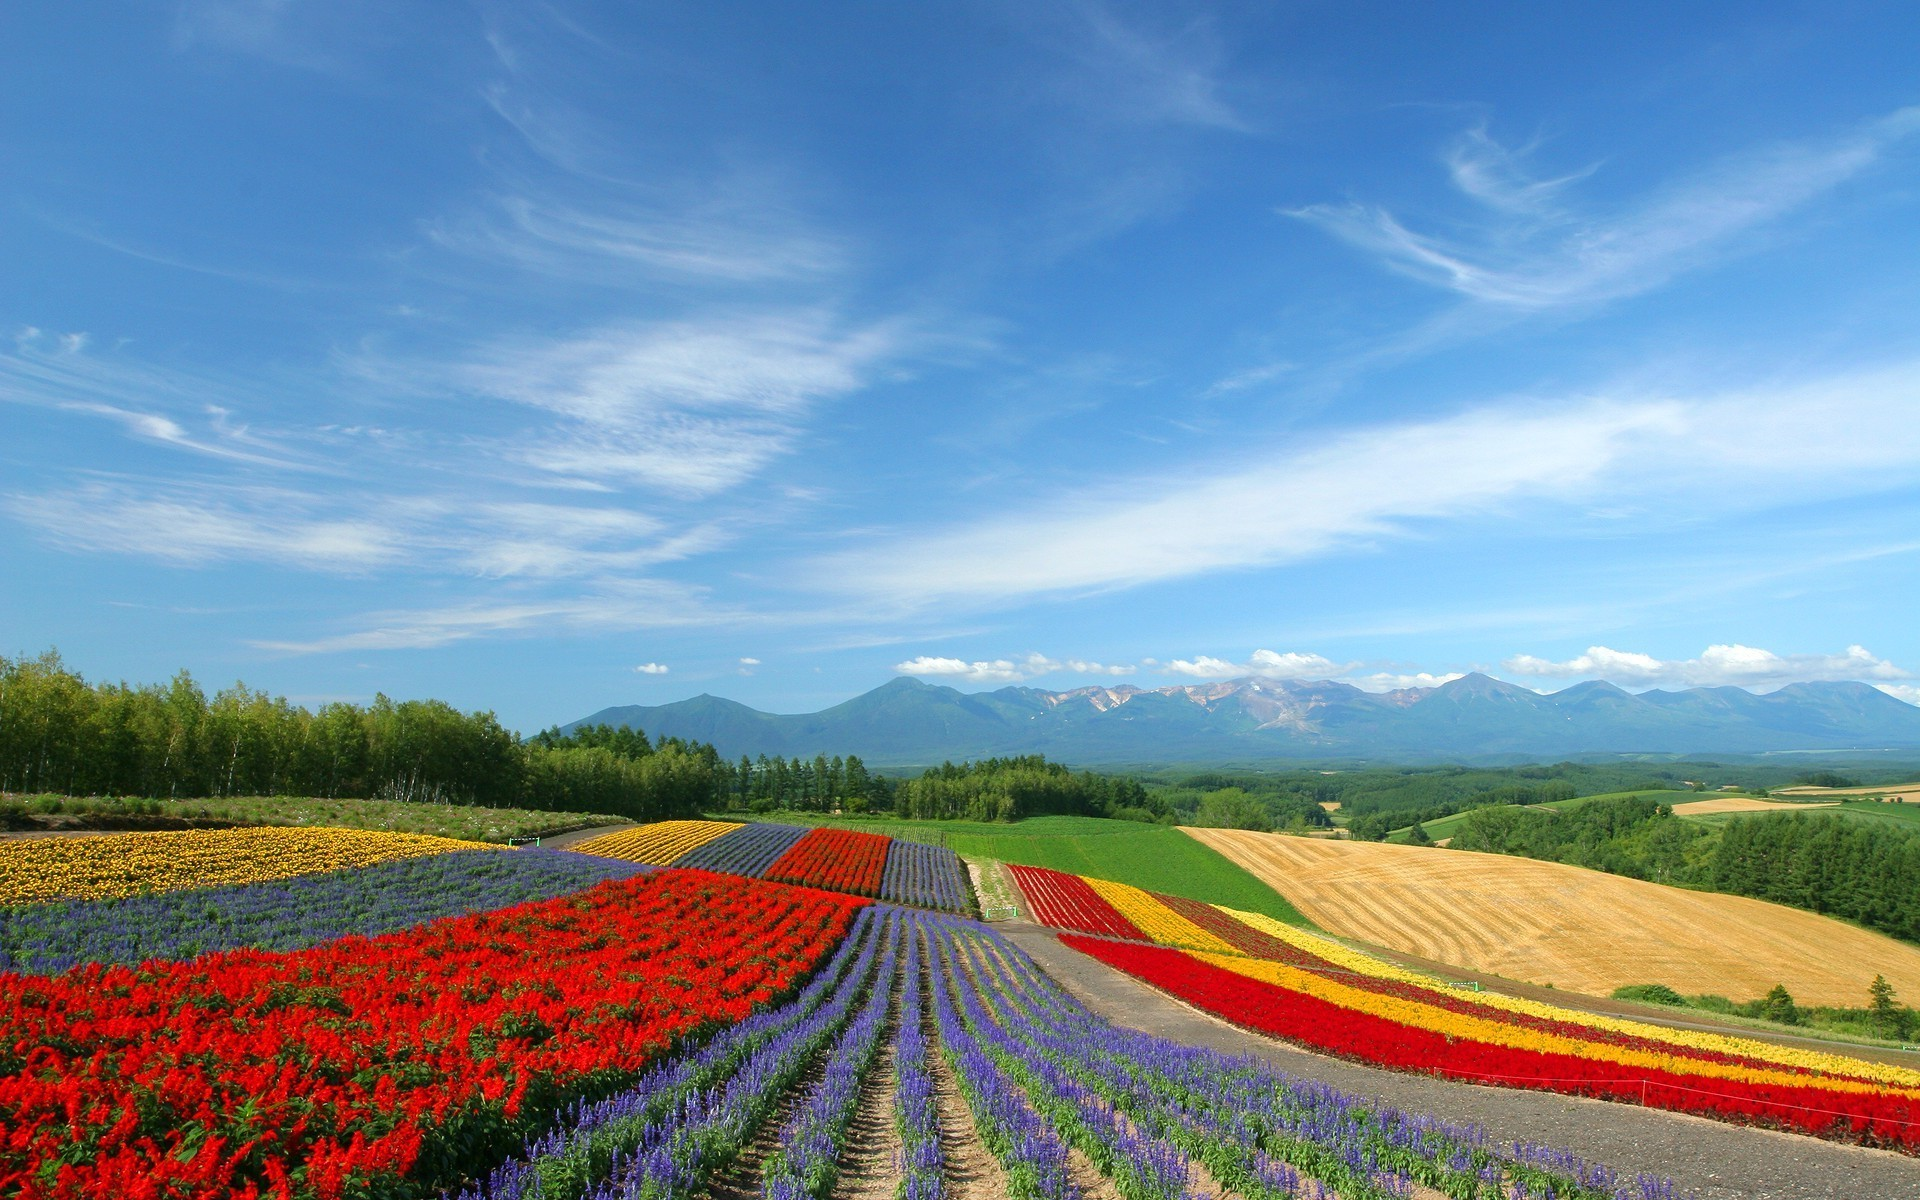 Japan Landscape Desktop Wallpaper 12434